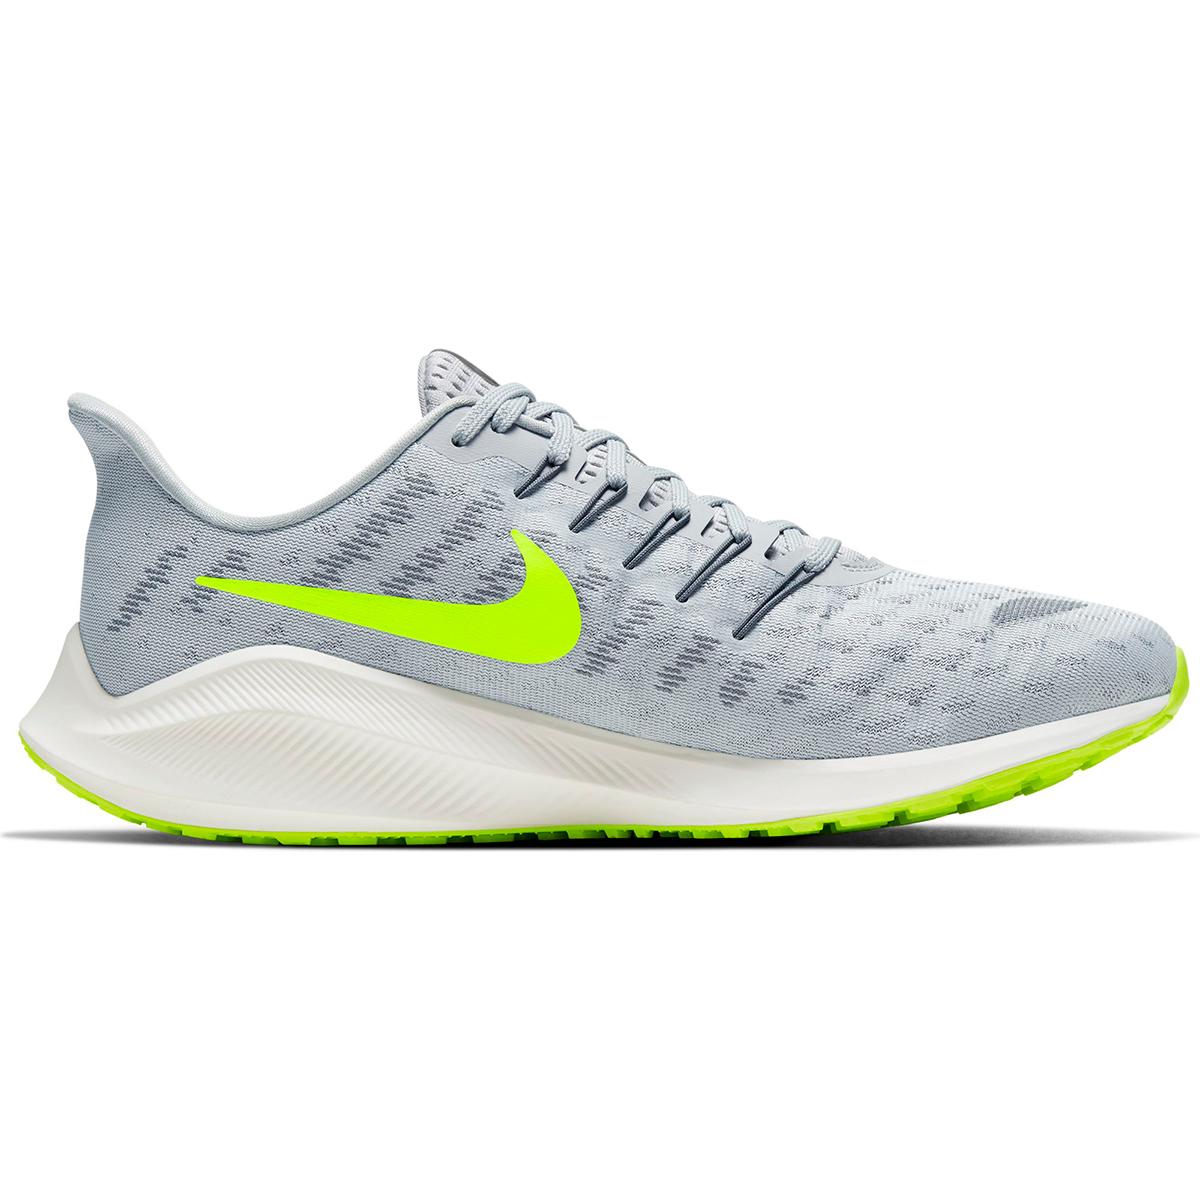 Men's Nike Air Zoom Vomero 14 Running Shoe - Color: Grey Fog/Smoke Grey/Volt/Sail (Regular Width) - Size: 6, Grey Fog/Smoke Grey/Volt/Sail, large, image 1